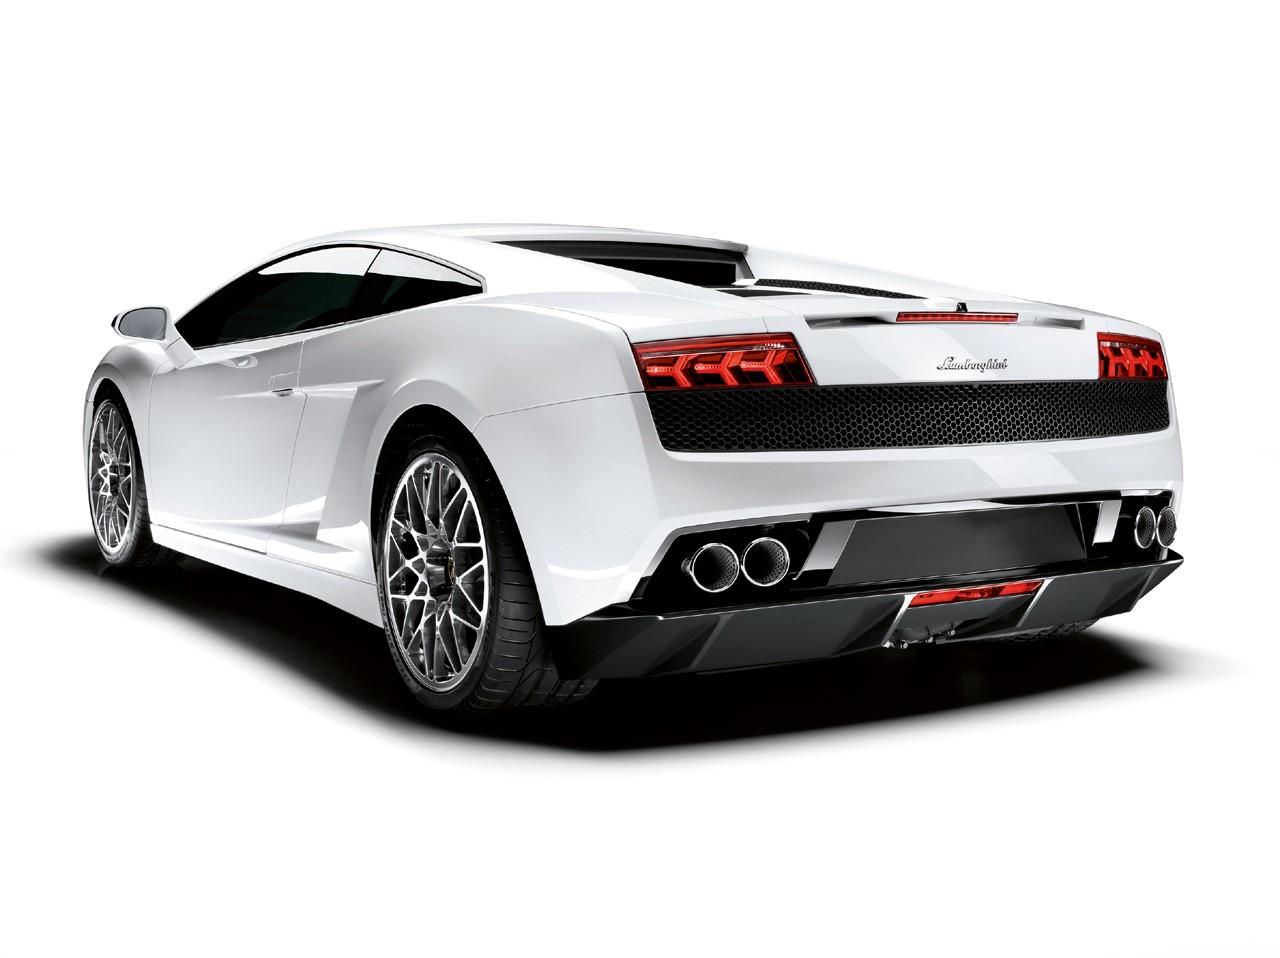 Lamborghini gallardo LP560-4 2